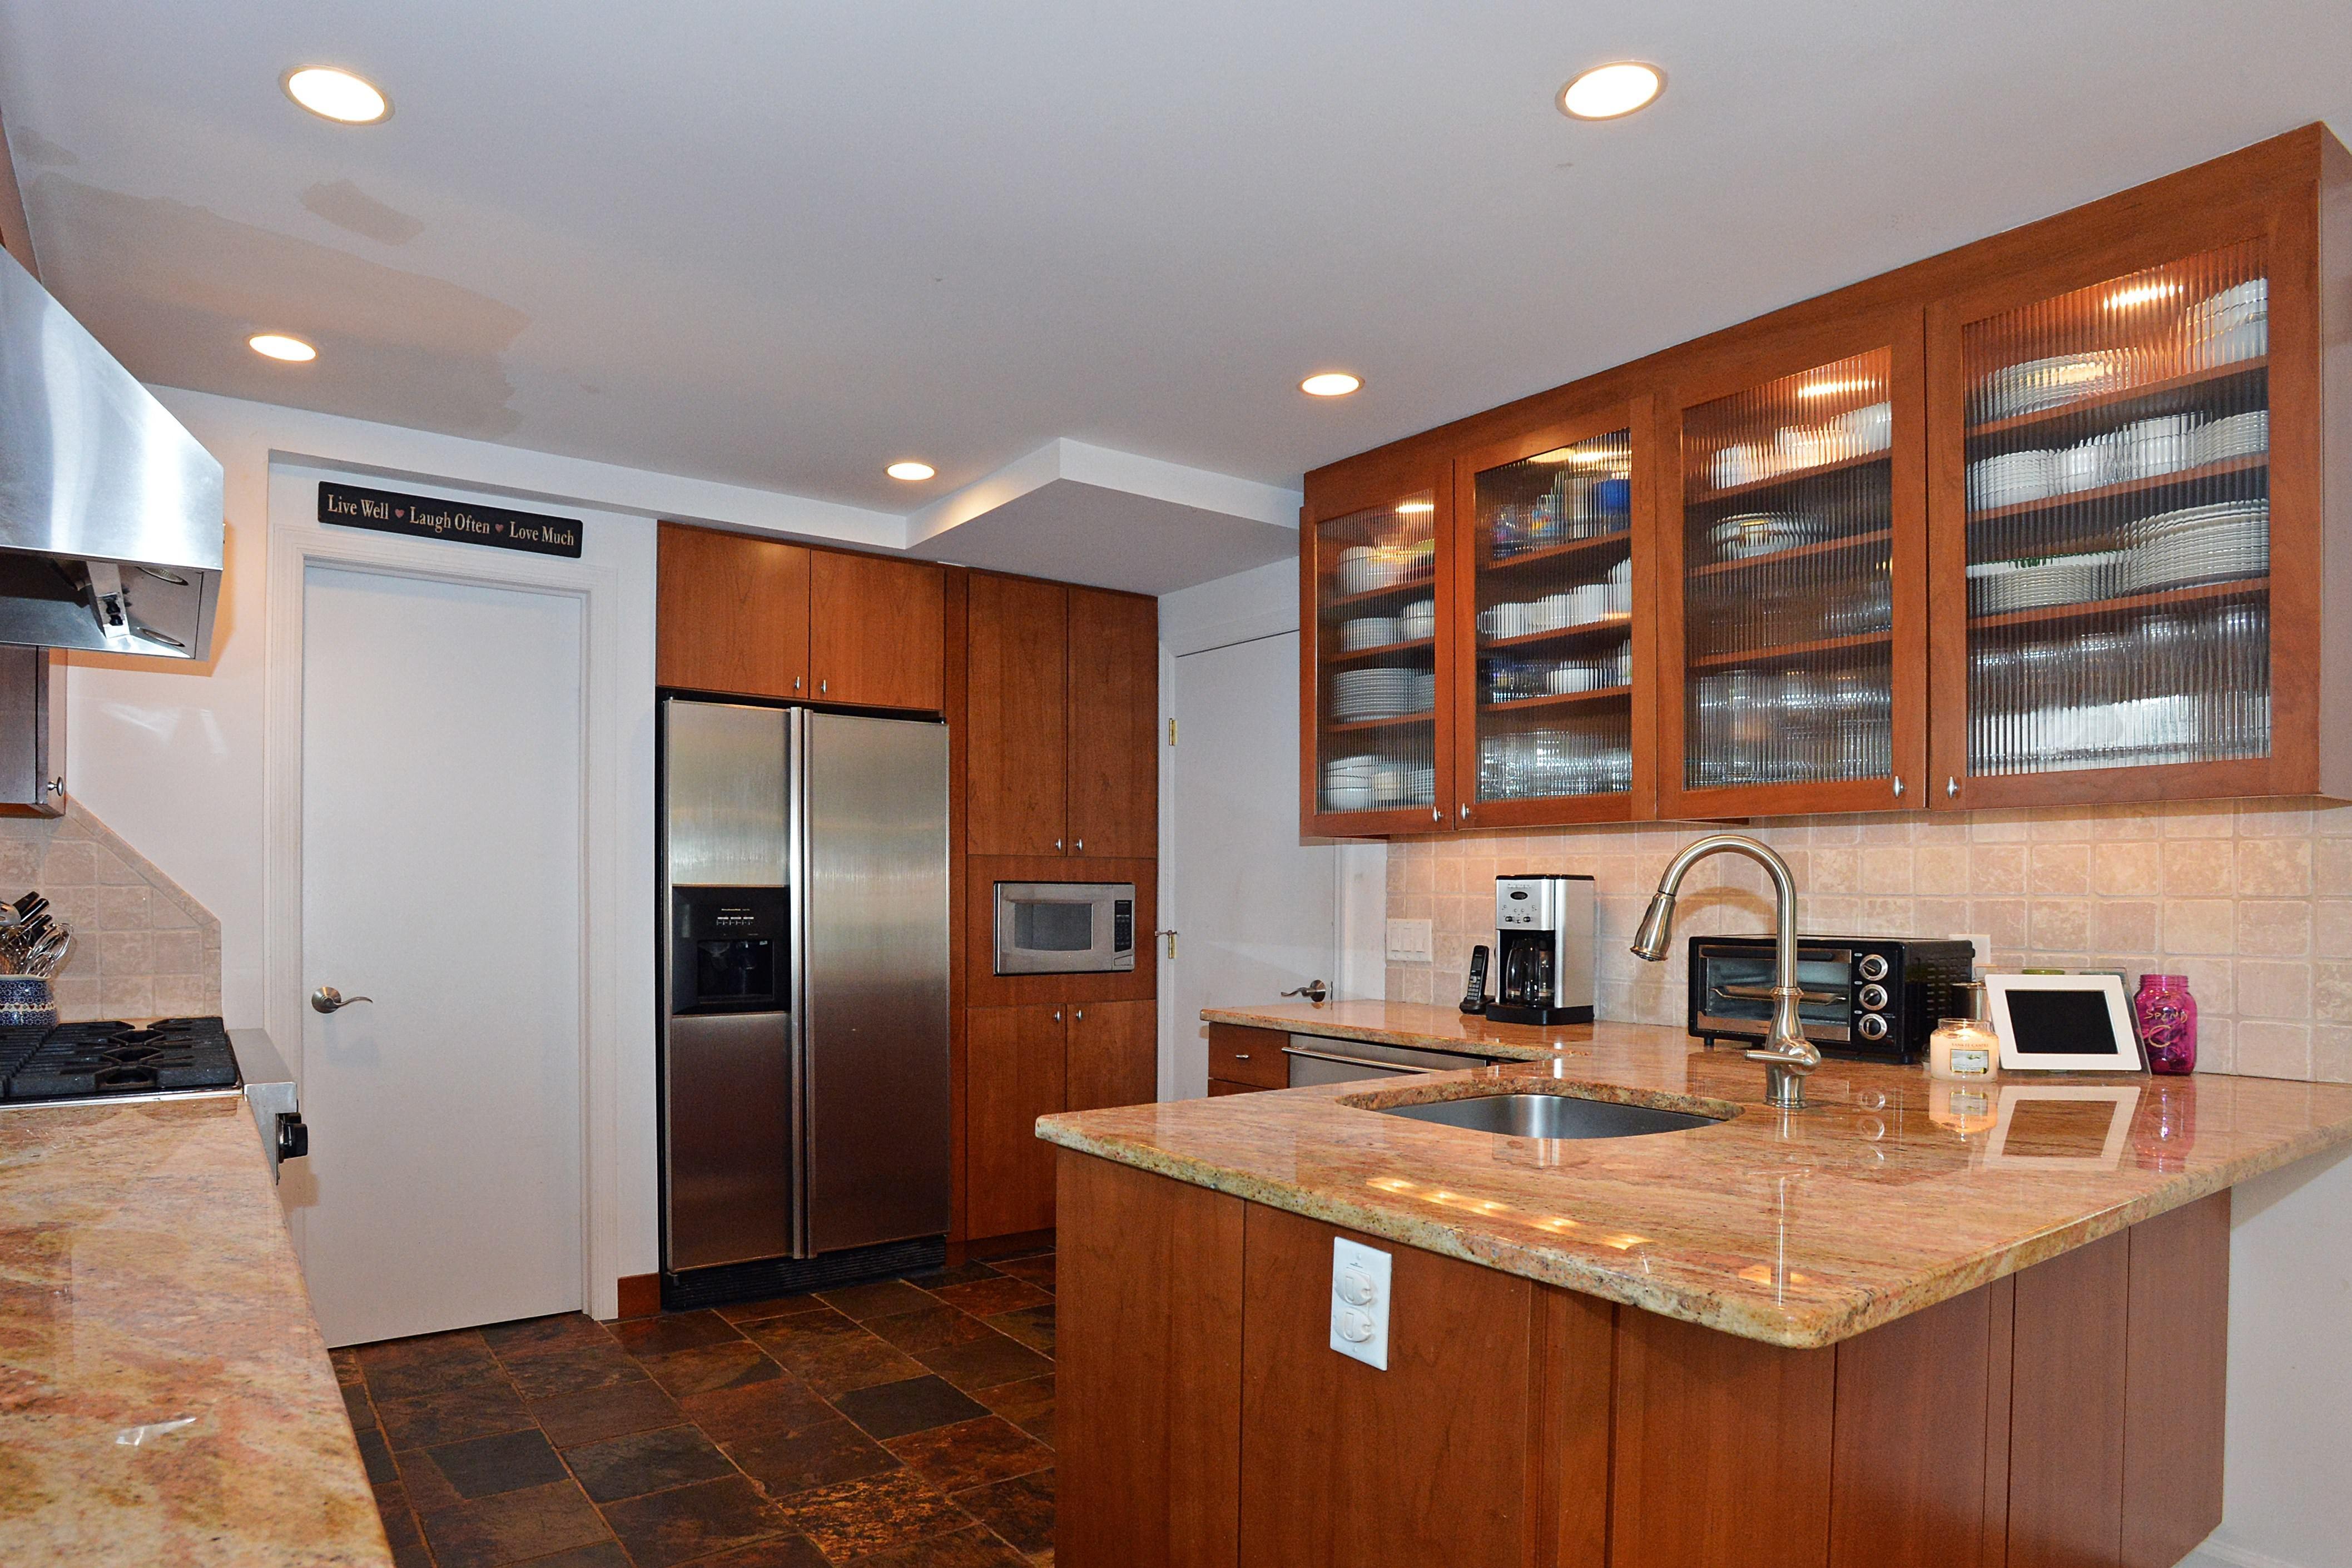 Kitchen cabinets summit nj - 12 Webster Ave Summit Nj 07901